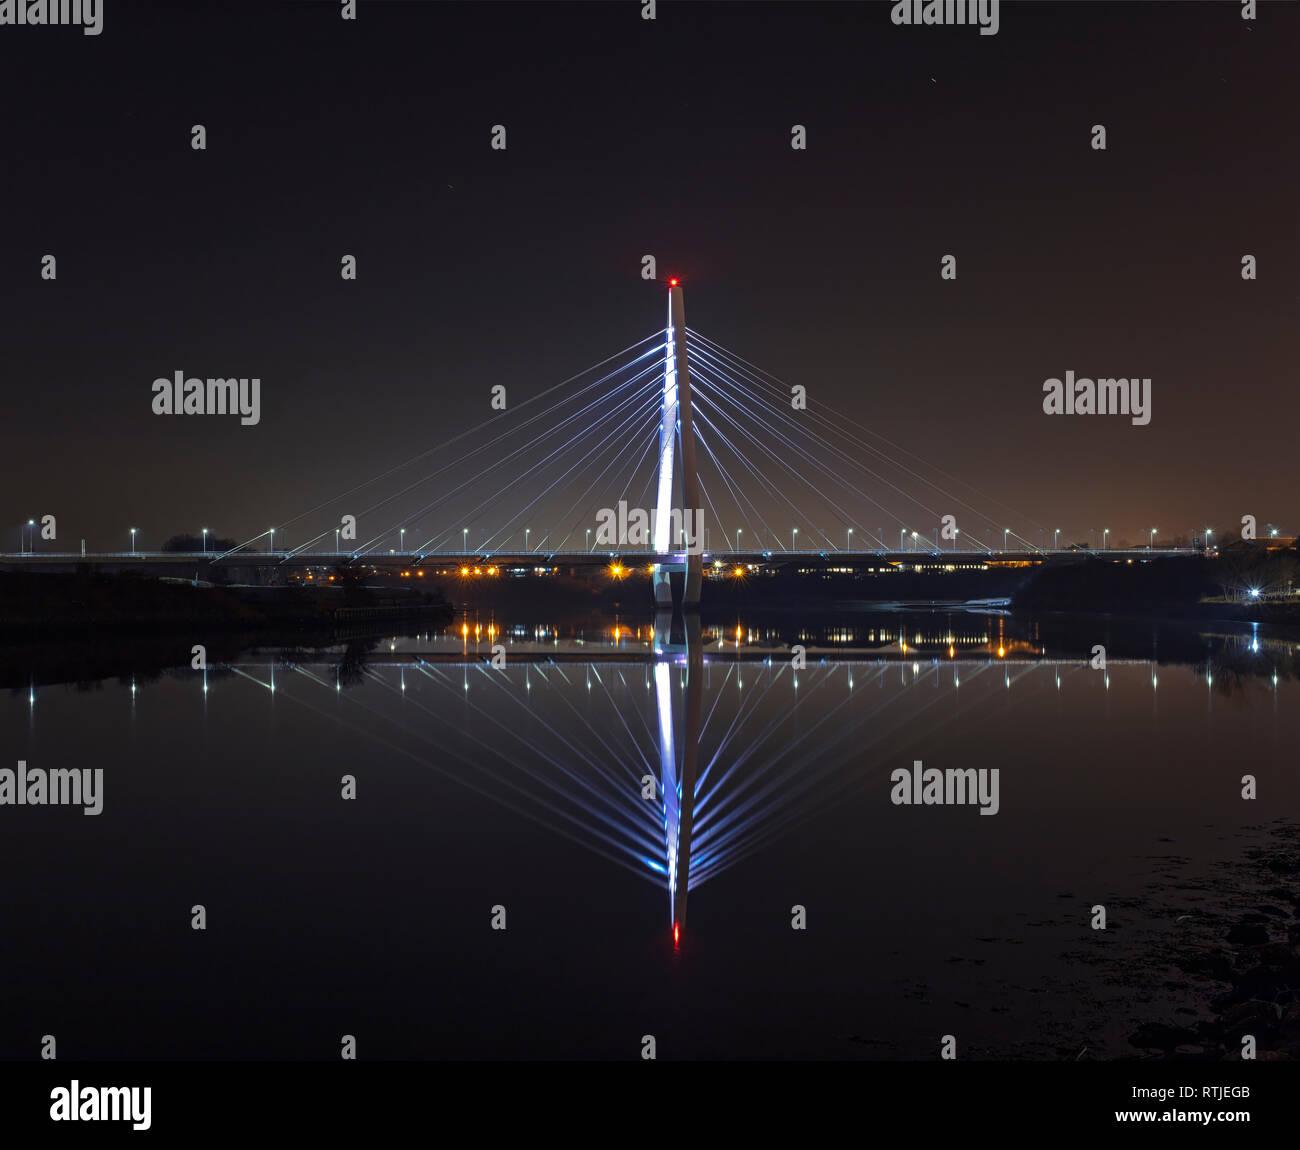 Northern Spire at night, Sunderland, Tyne & Wear, England, United Kingdom - Stock Image